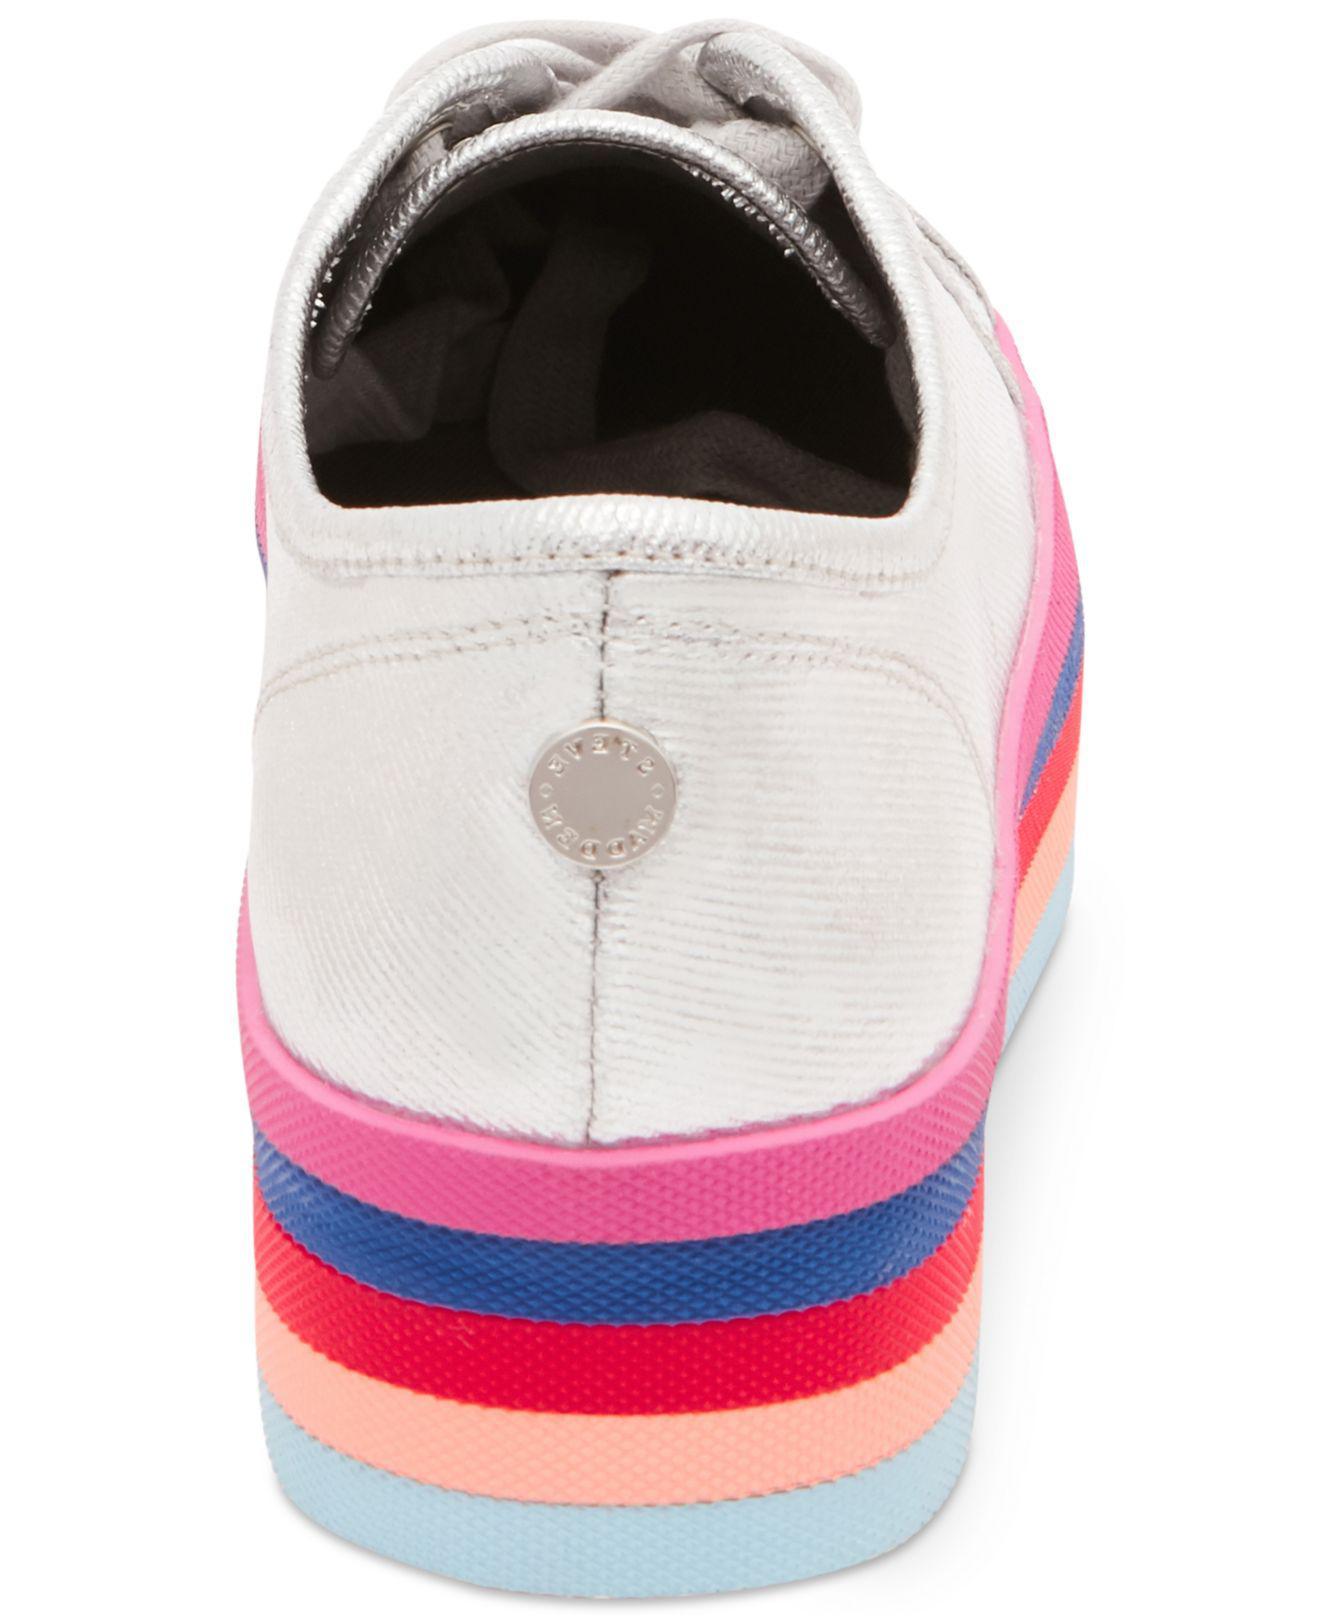 ae80ccc0c6b Lyst - Steve Madden Women s Rainbow Flatform Sneakers in Metallic